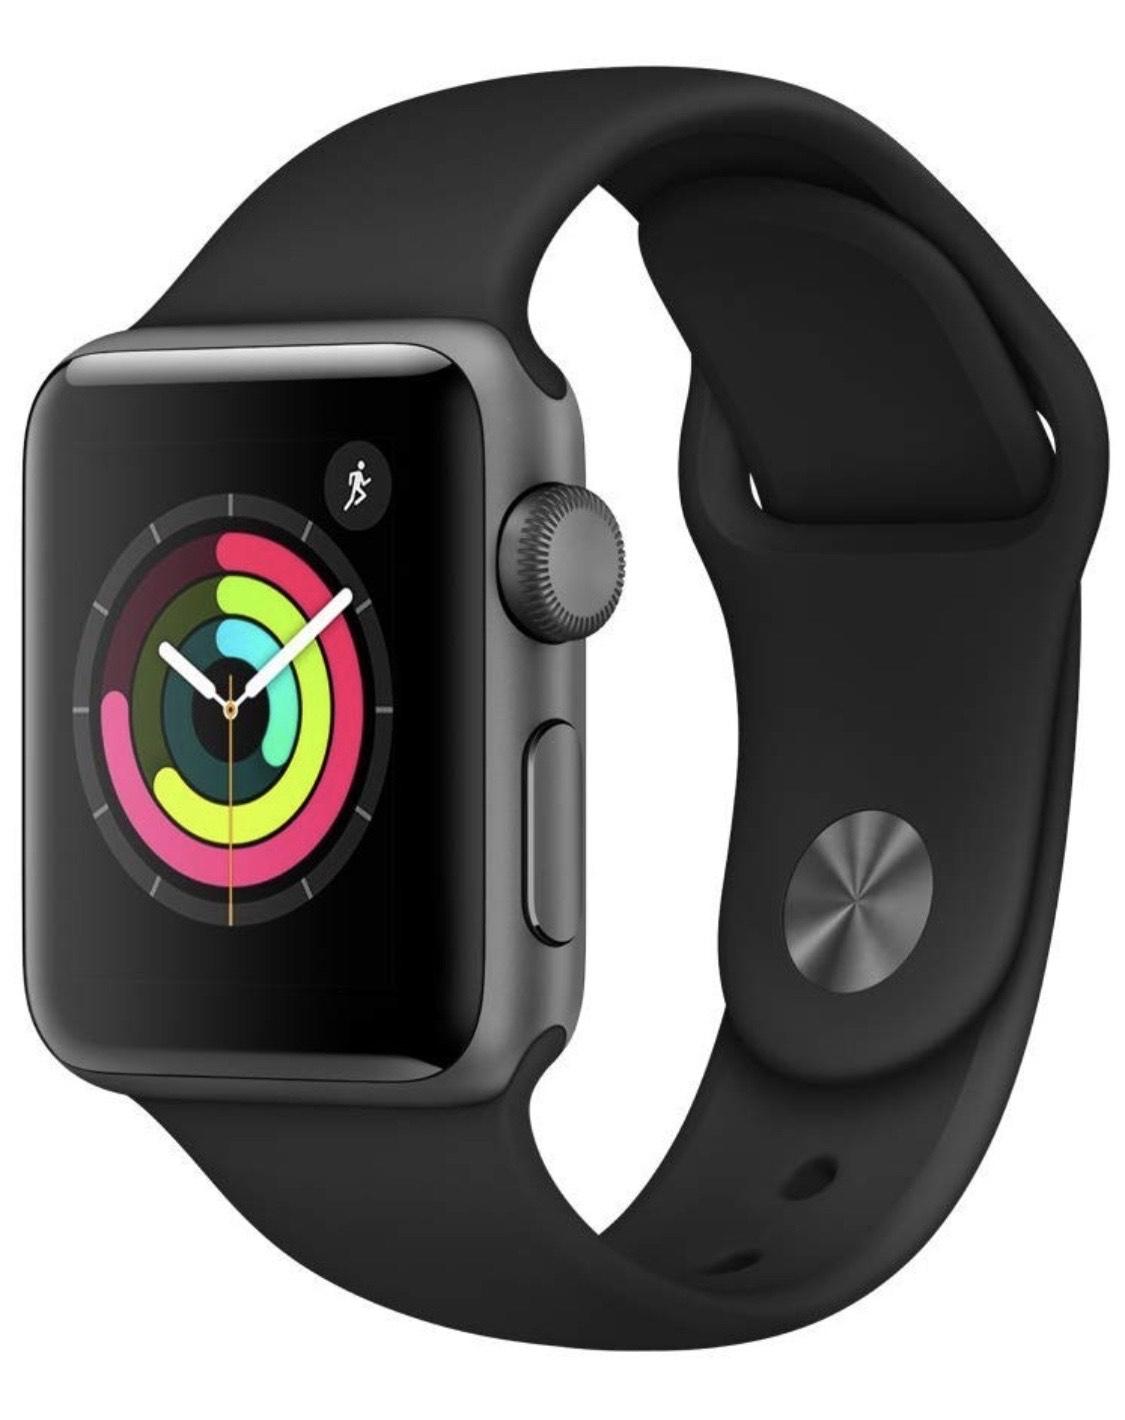 Apple Watch Series 3 (38mm) £185 @ Amazon